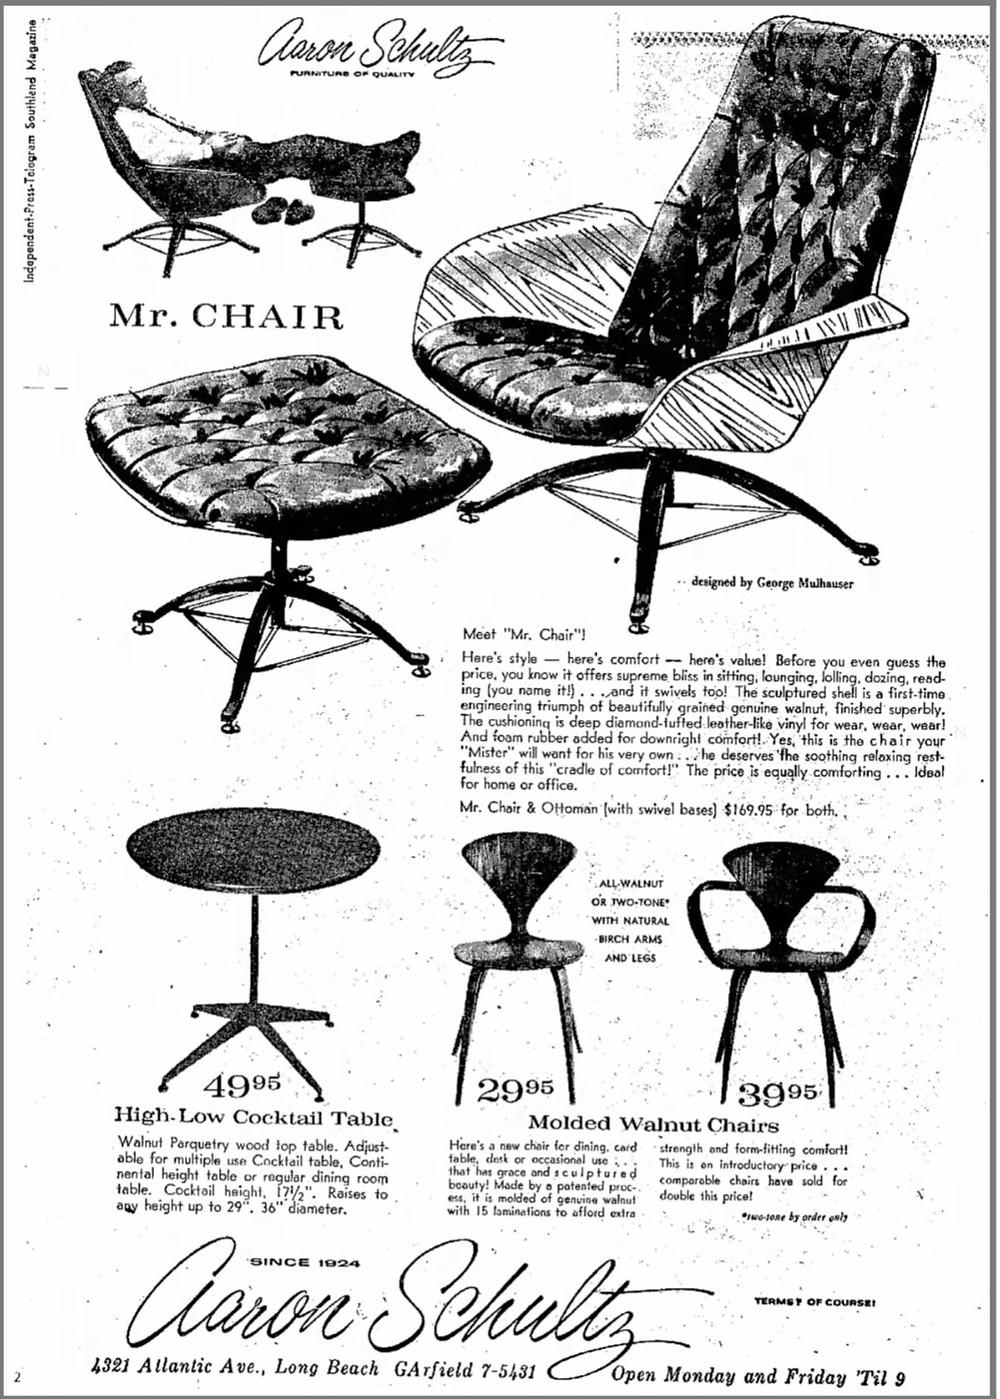 vintage Mr. Chair ad